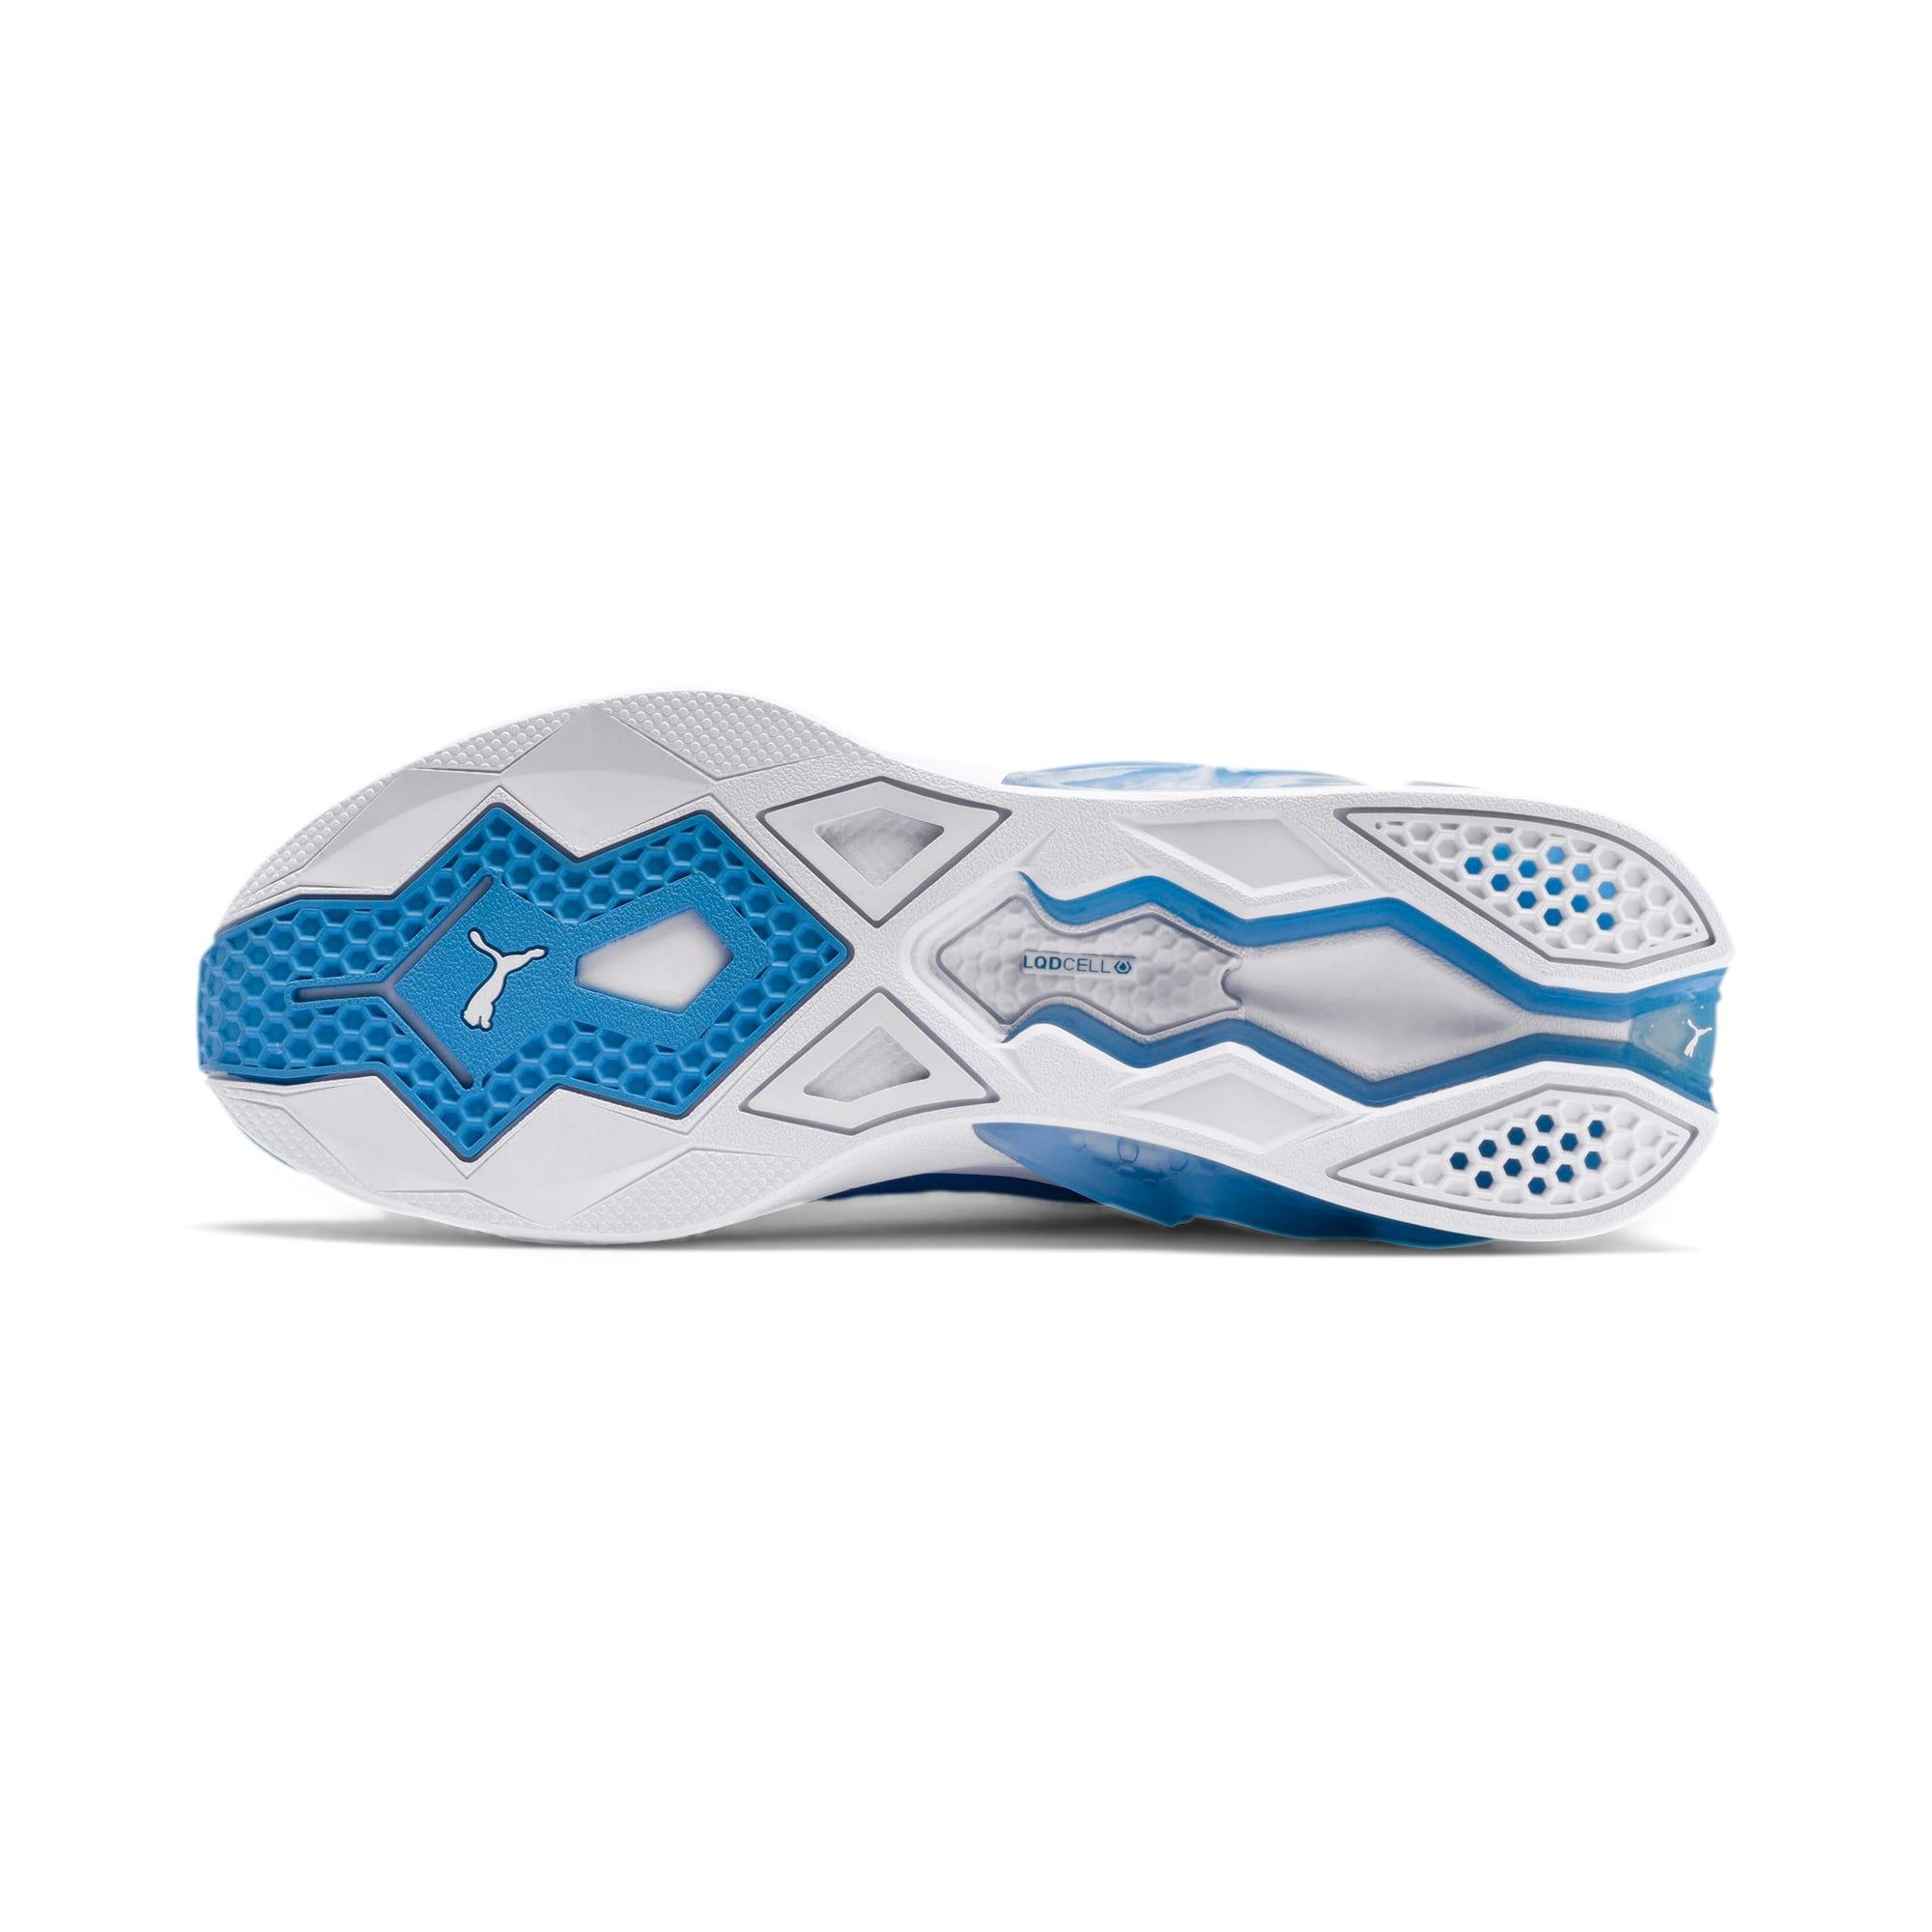 Thumbnail 4 of LQDCELL Origin Men's Training Shoes, Puma White-B Blue-Blz Yellow, medium